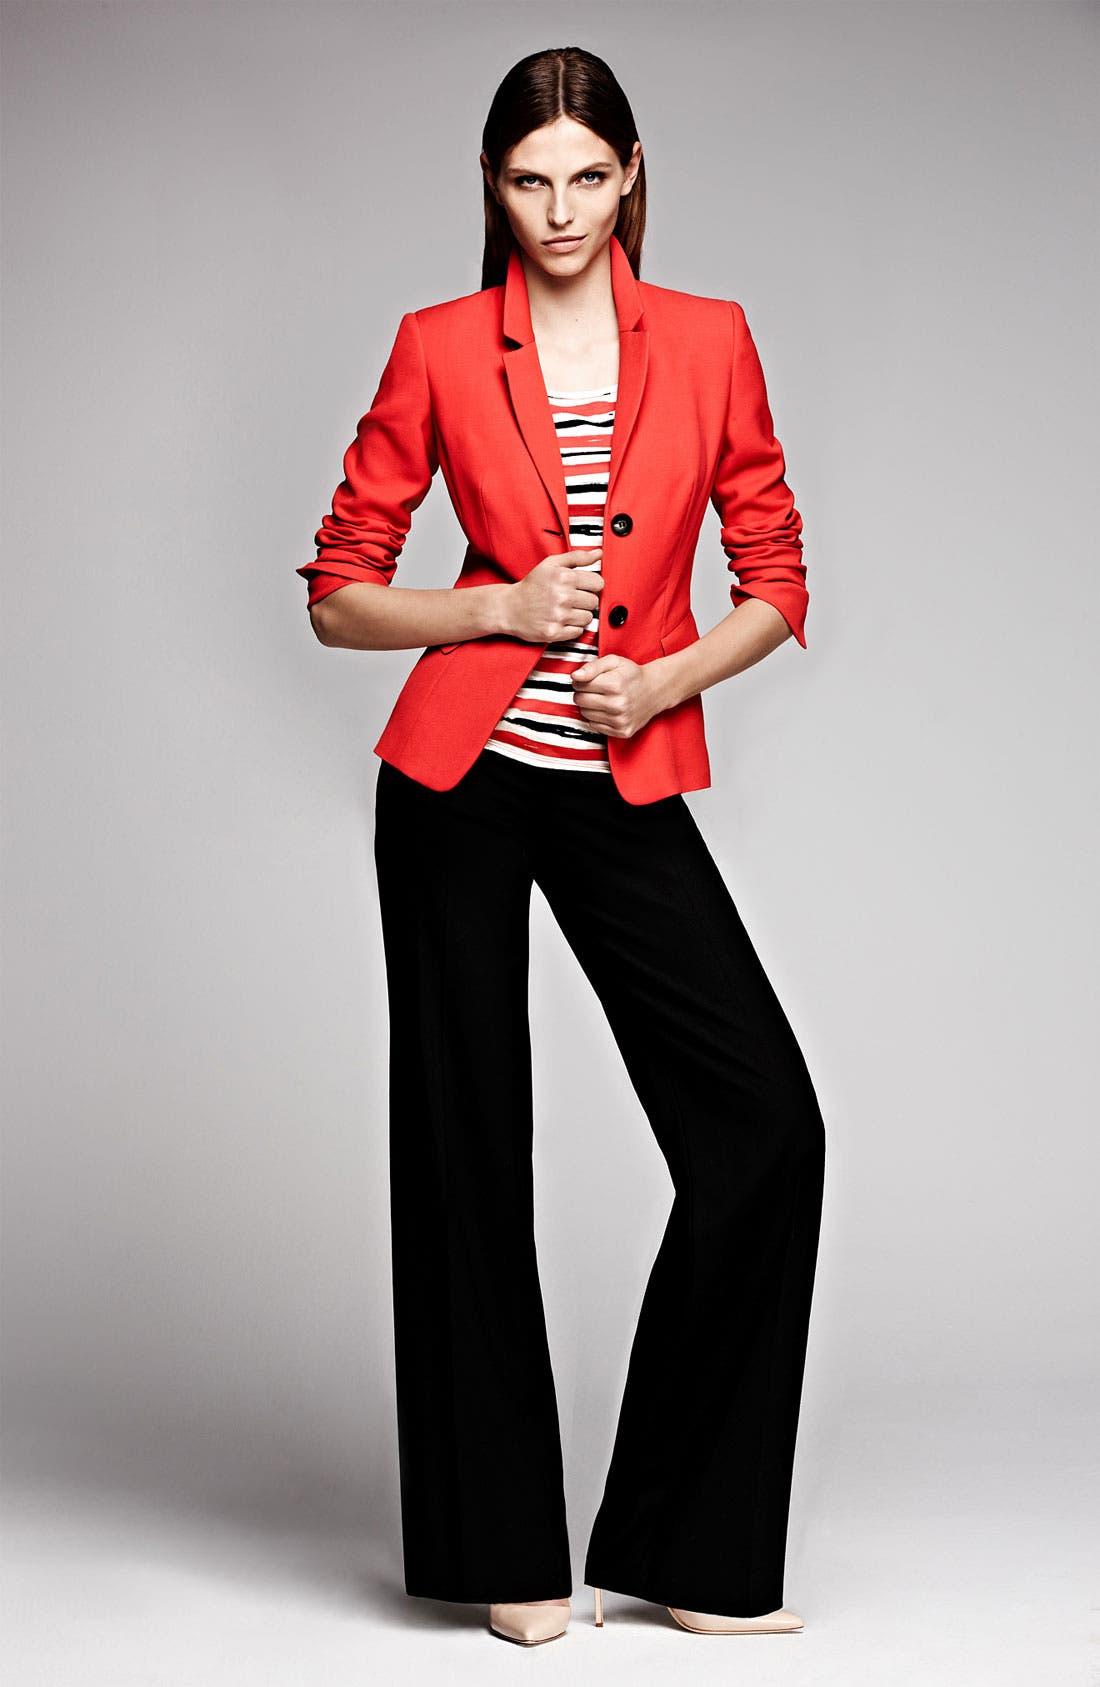 Alternate Image 1 Selected - Lafayette 148 New York Jacket, Tee & Trousers